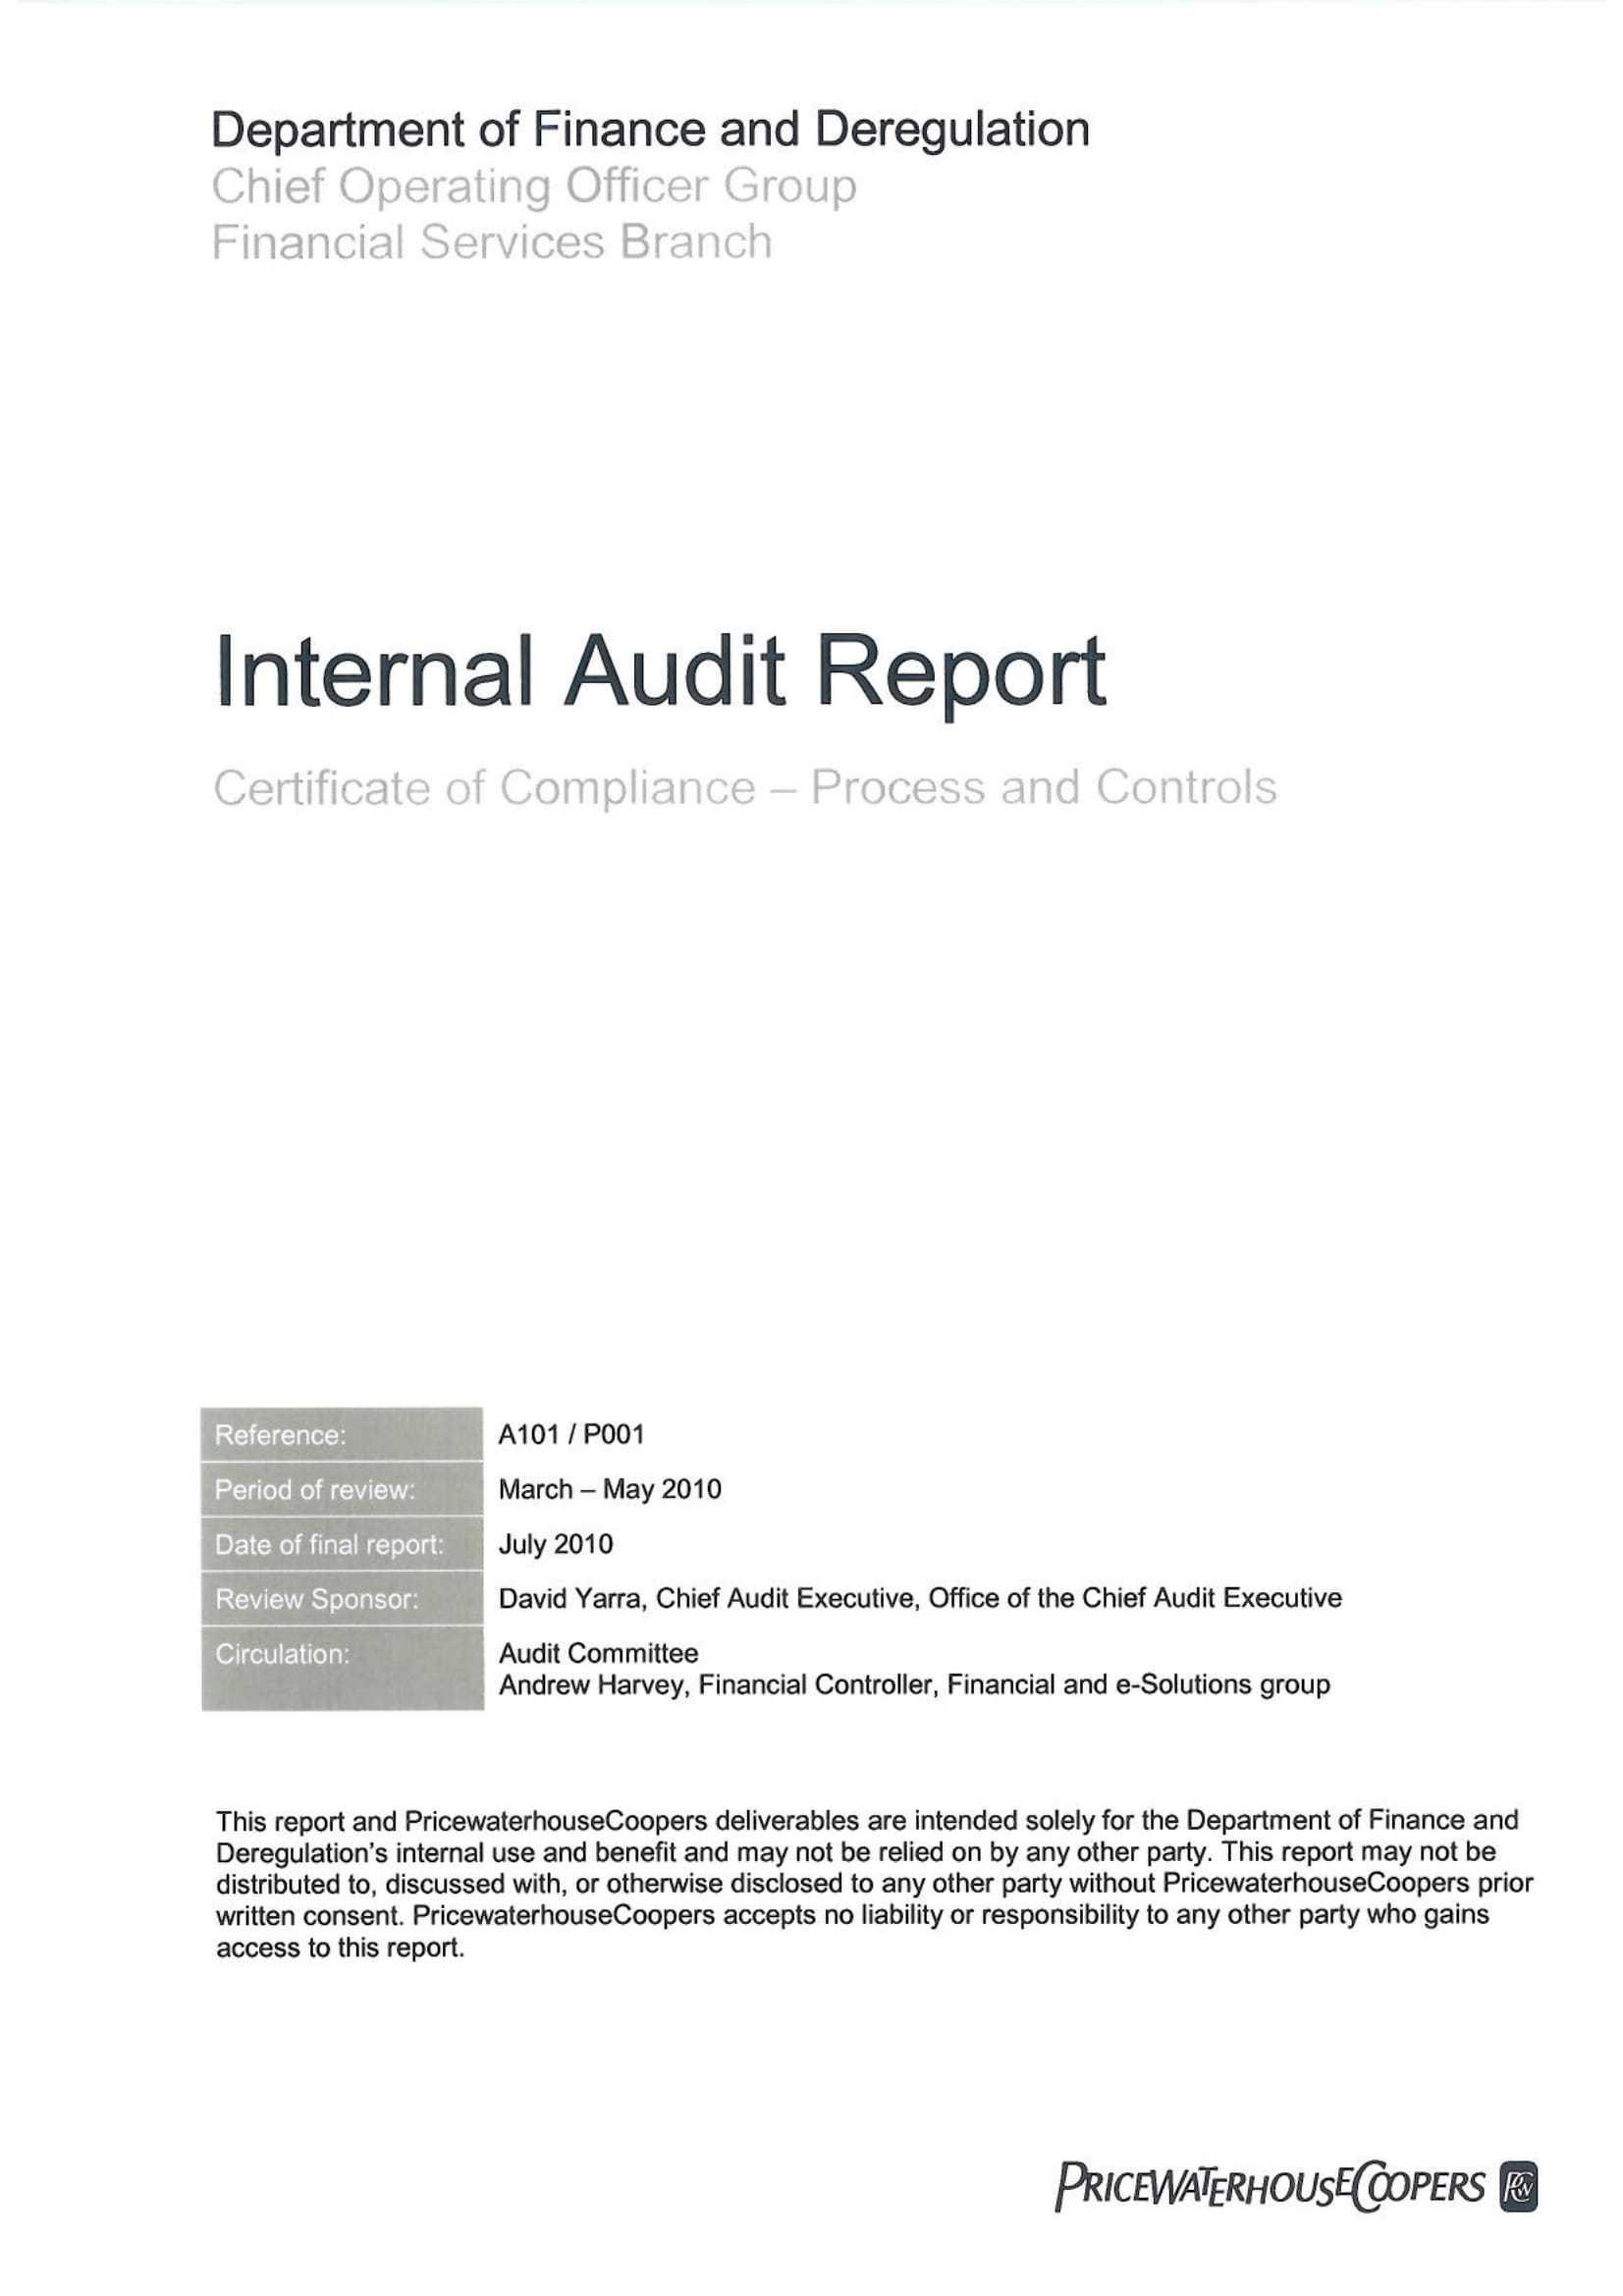 14+ Internal Audit Report Examples - Pdf, Word | Examples Within Internal Control Audit Report Template